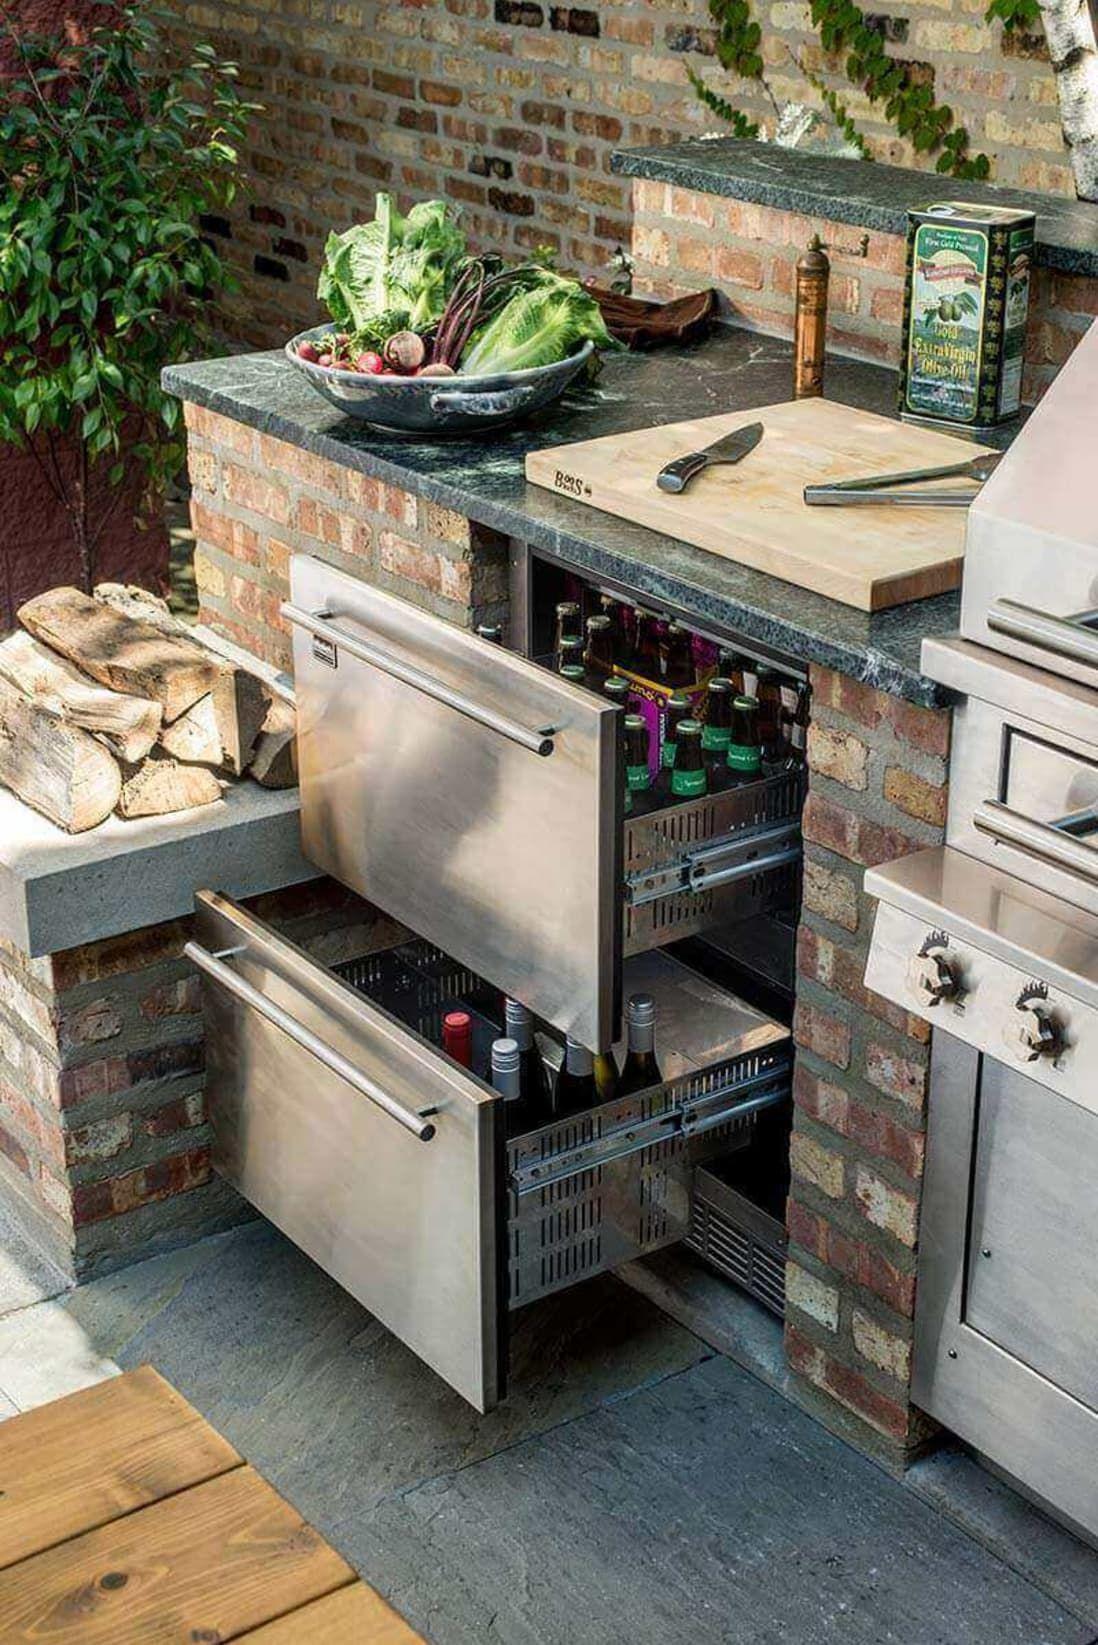 30 Outdoor Kitchen Ideas Inspirations In 2020 Backyard Kitchen Outdoor Kitchen Countertops Outdoor Kitchen Design